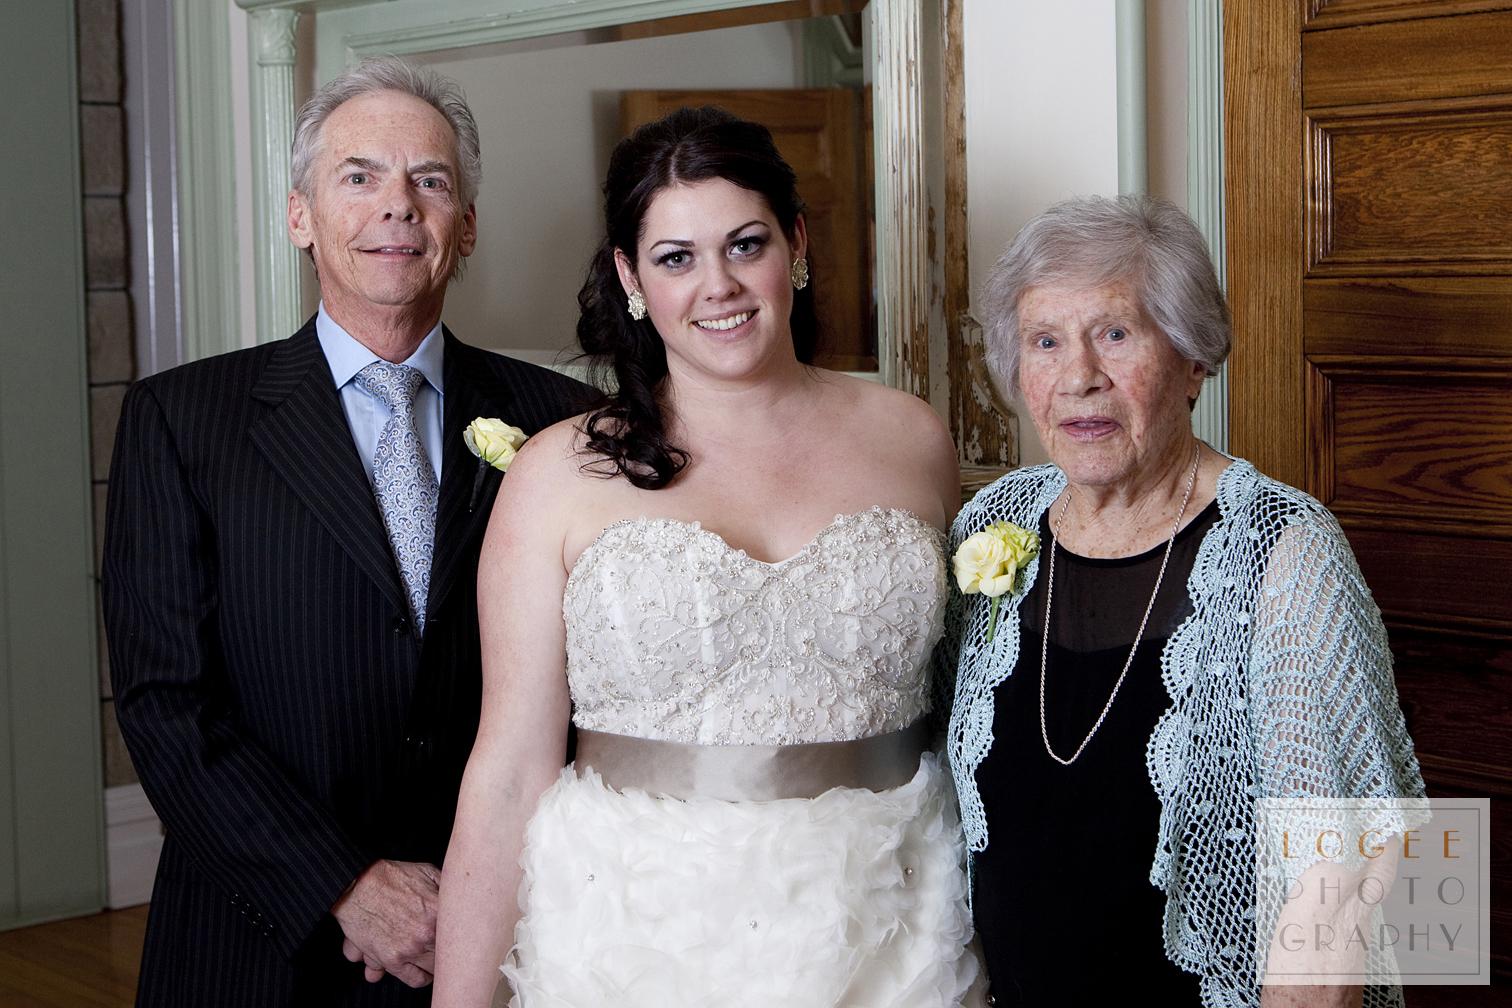 McIntosh-Burns Wedding - 7012Aw